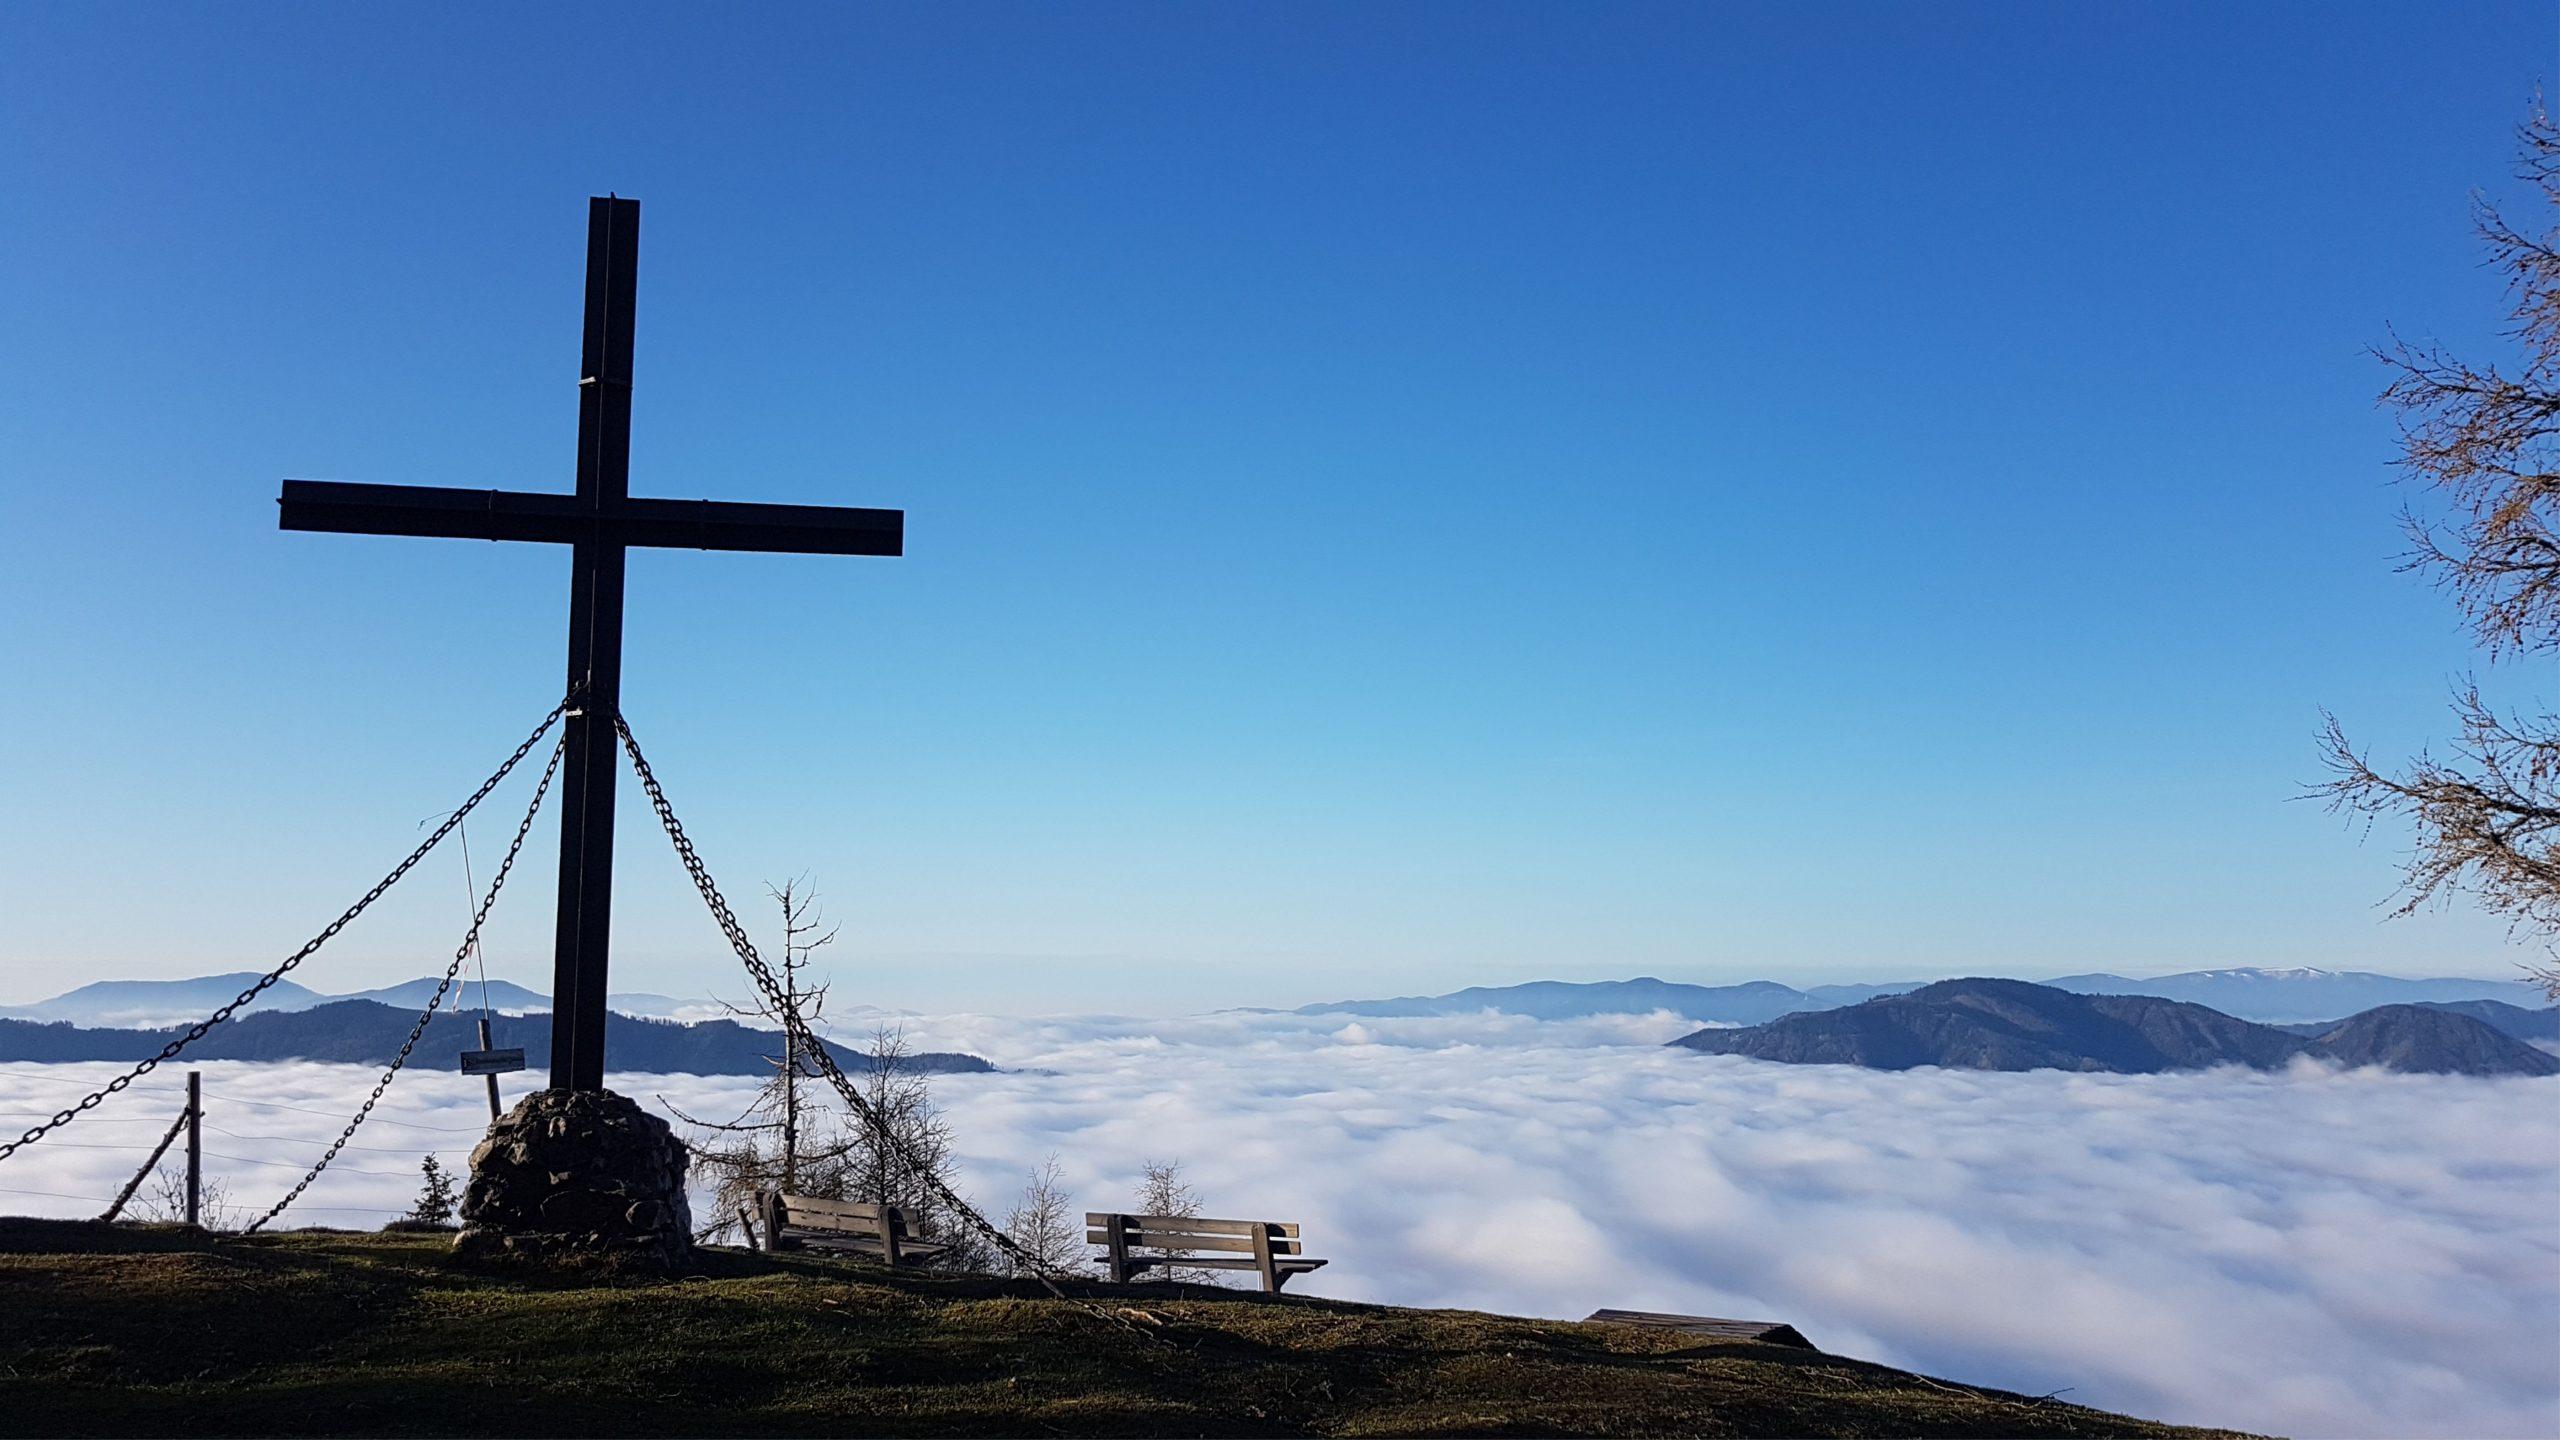 Gipfelkreuz2k